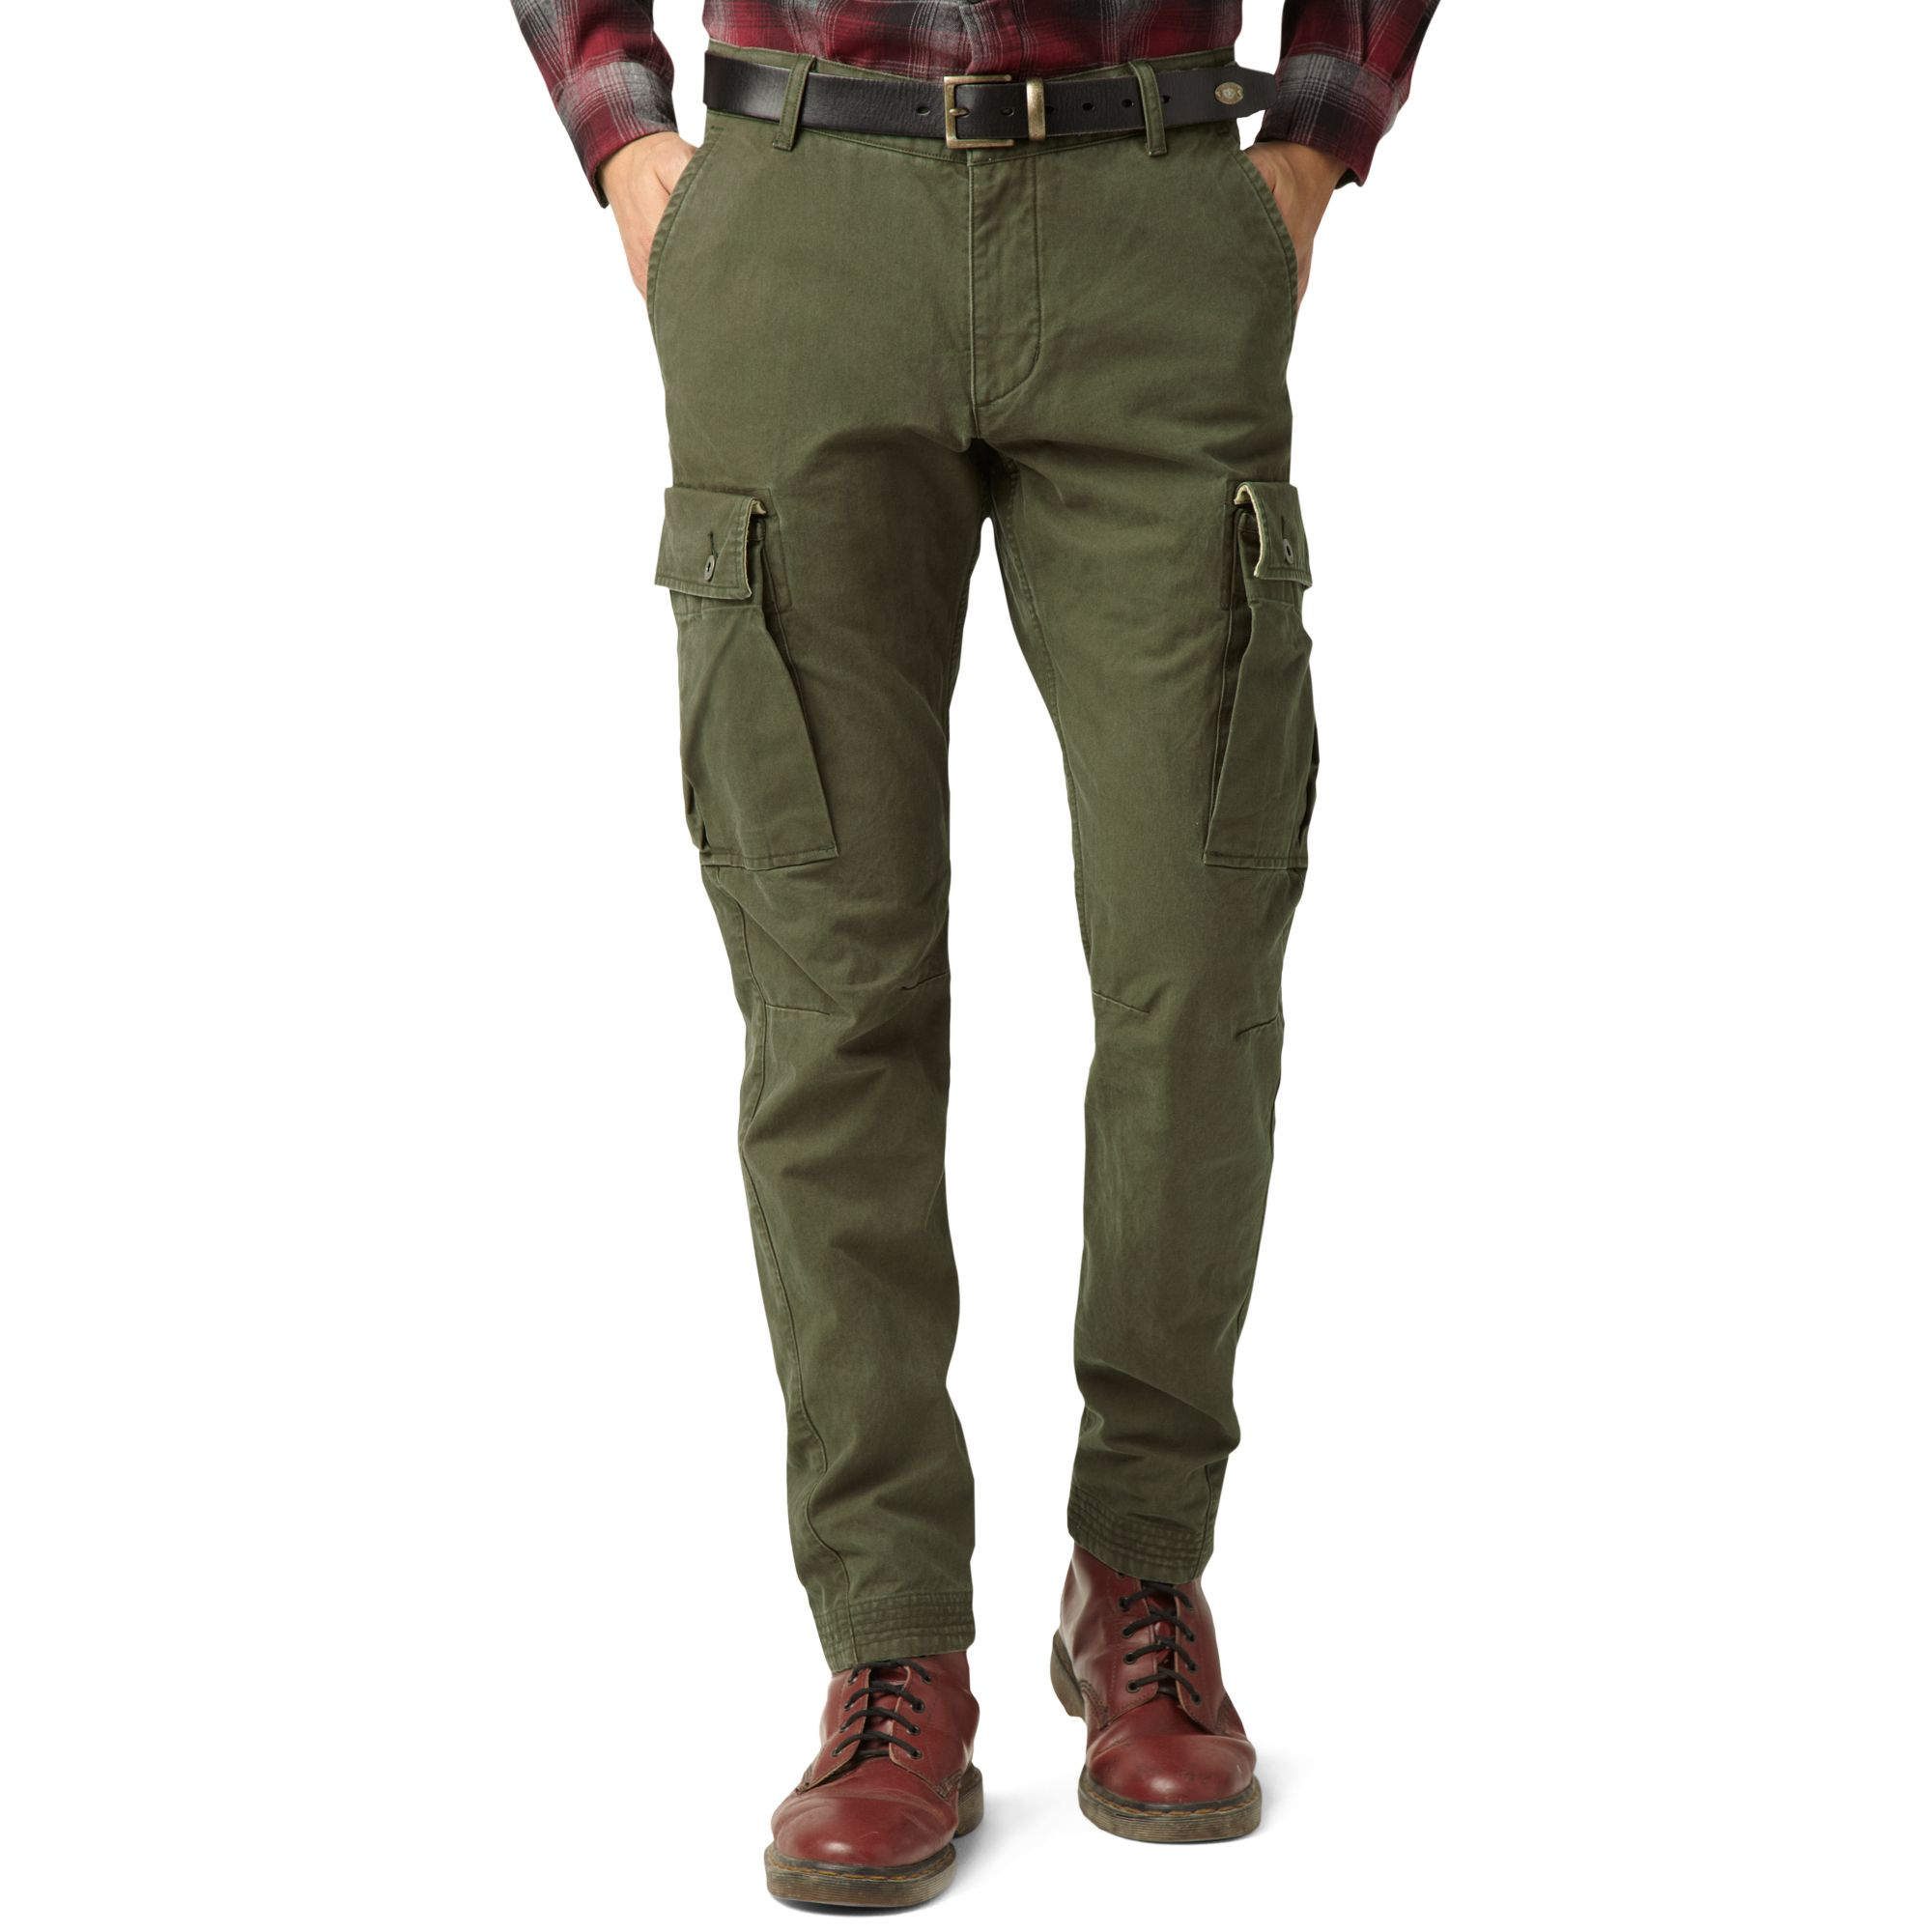 green khaki pants men - Pi Pants